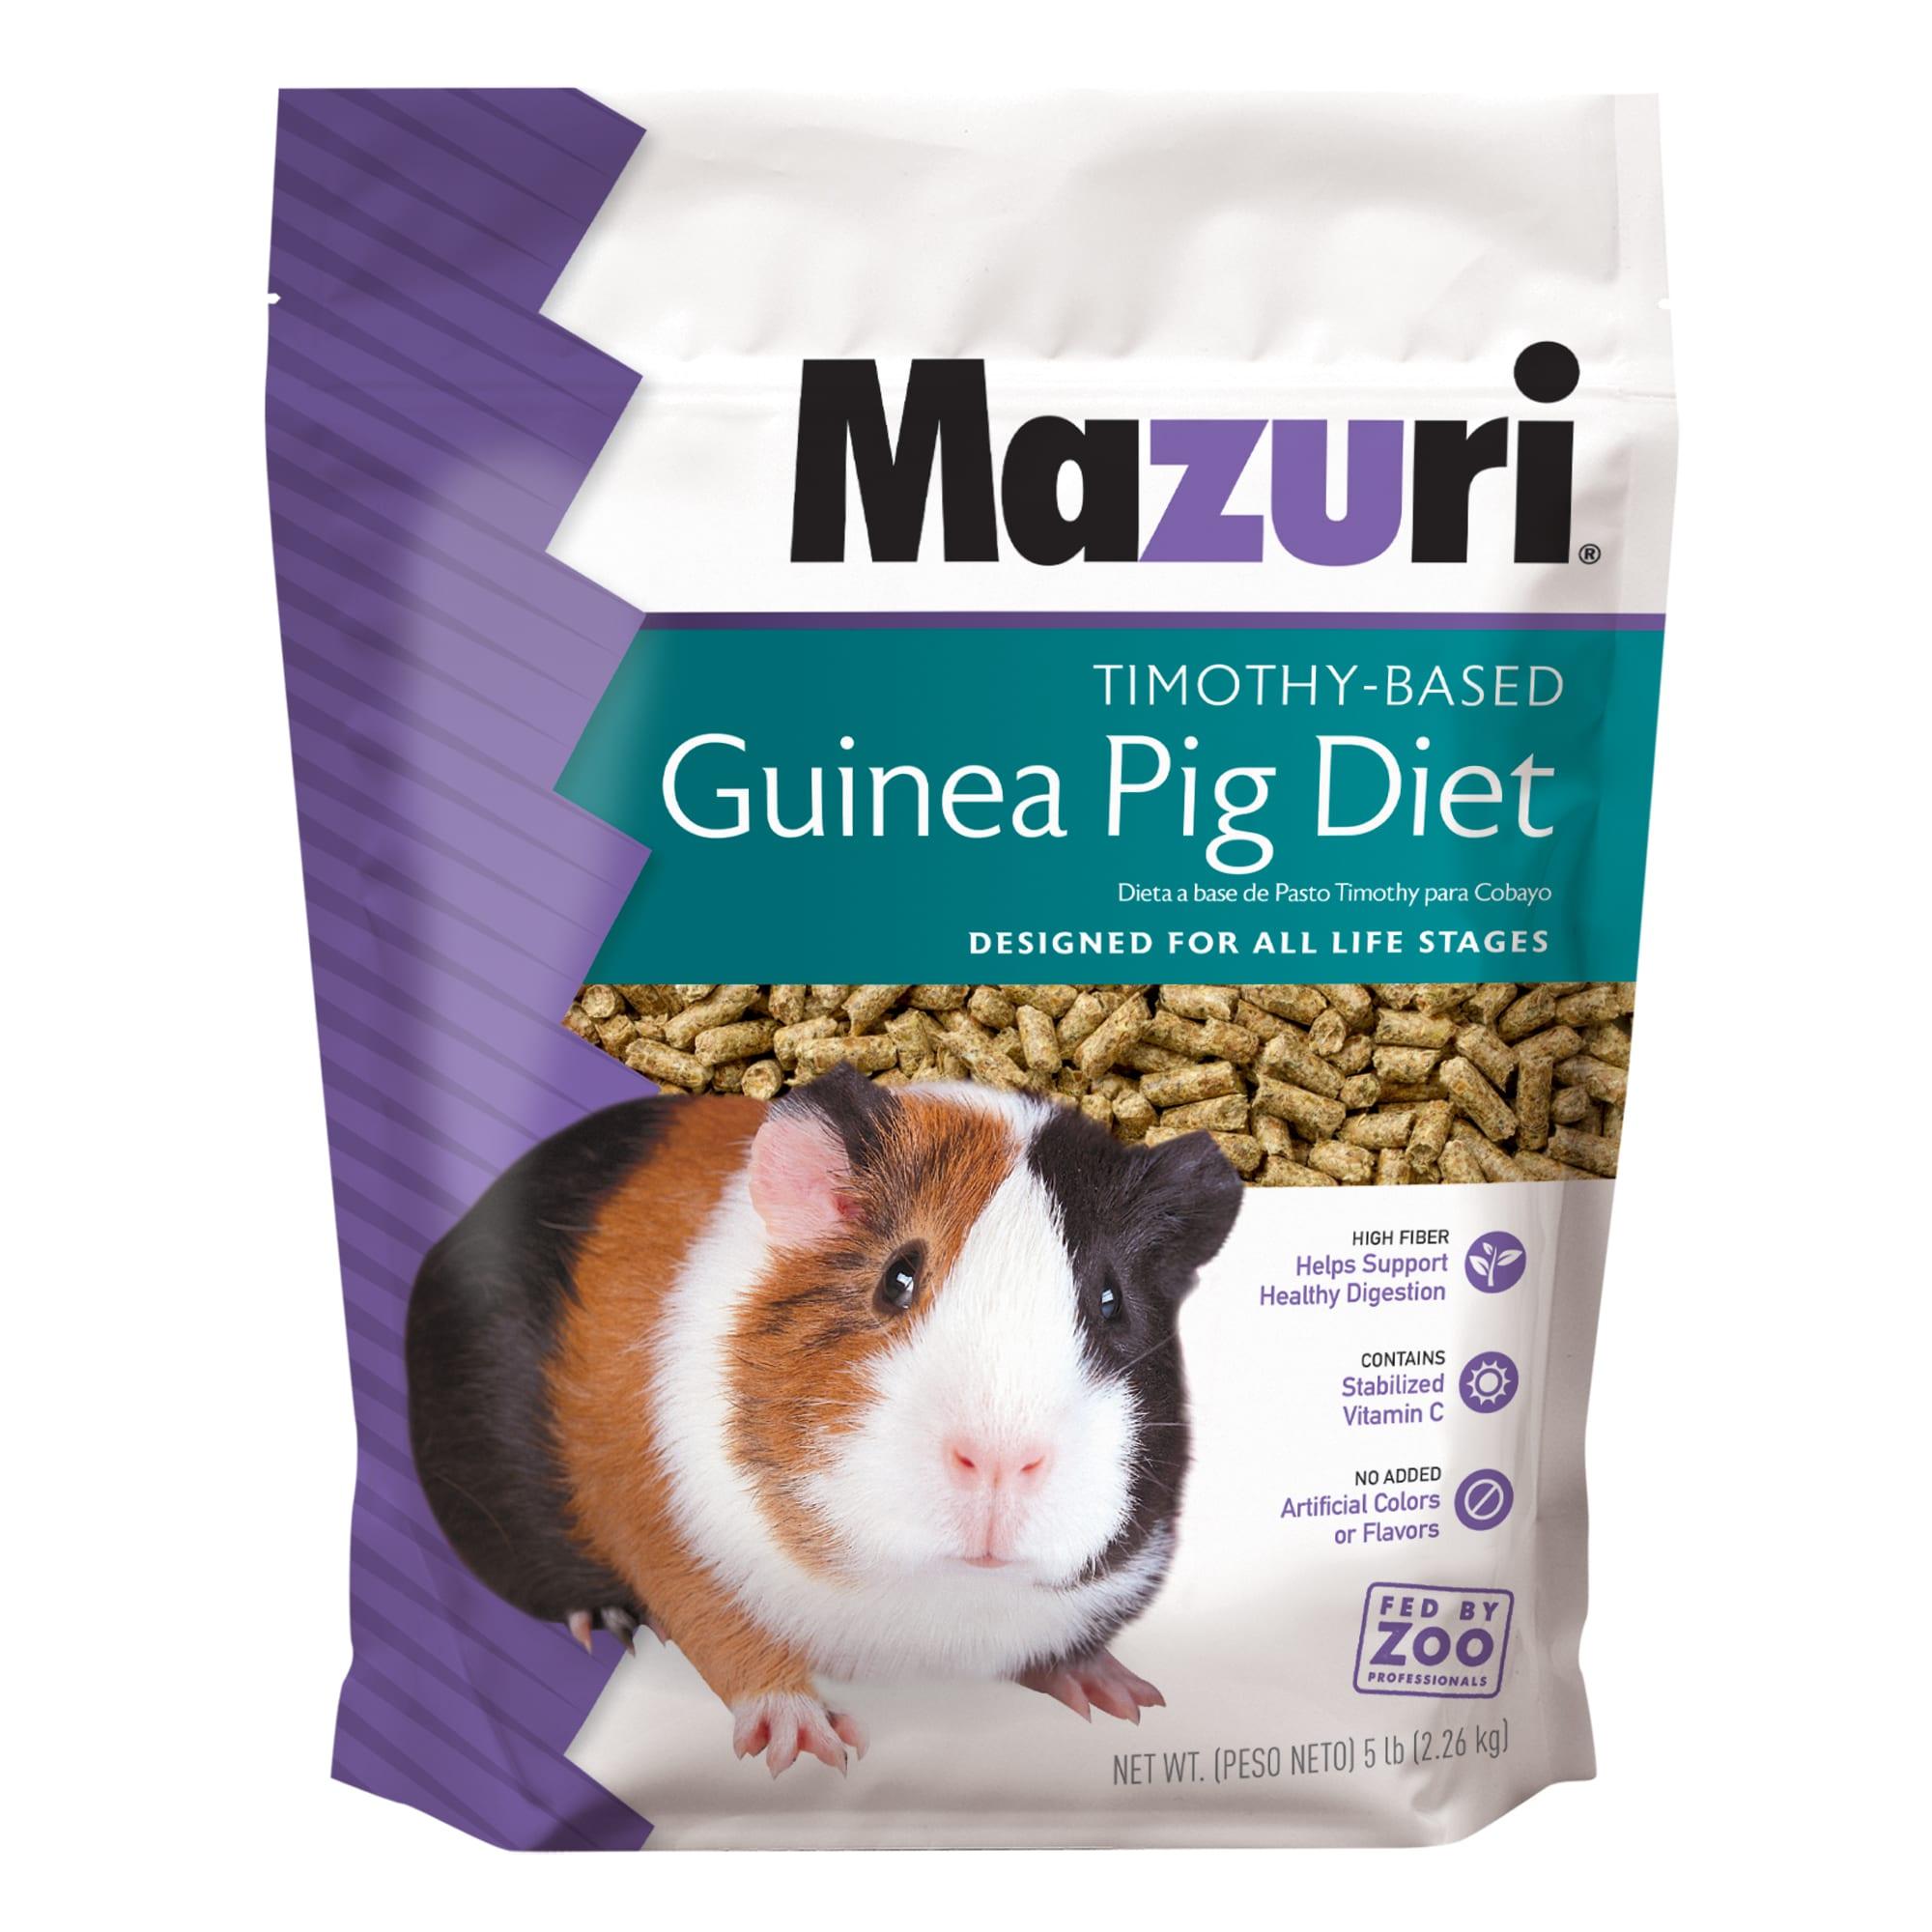 Mazuri Timothy Based Guinea Pig Food 5 Lbs Petco